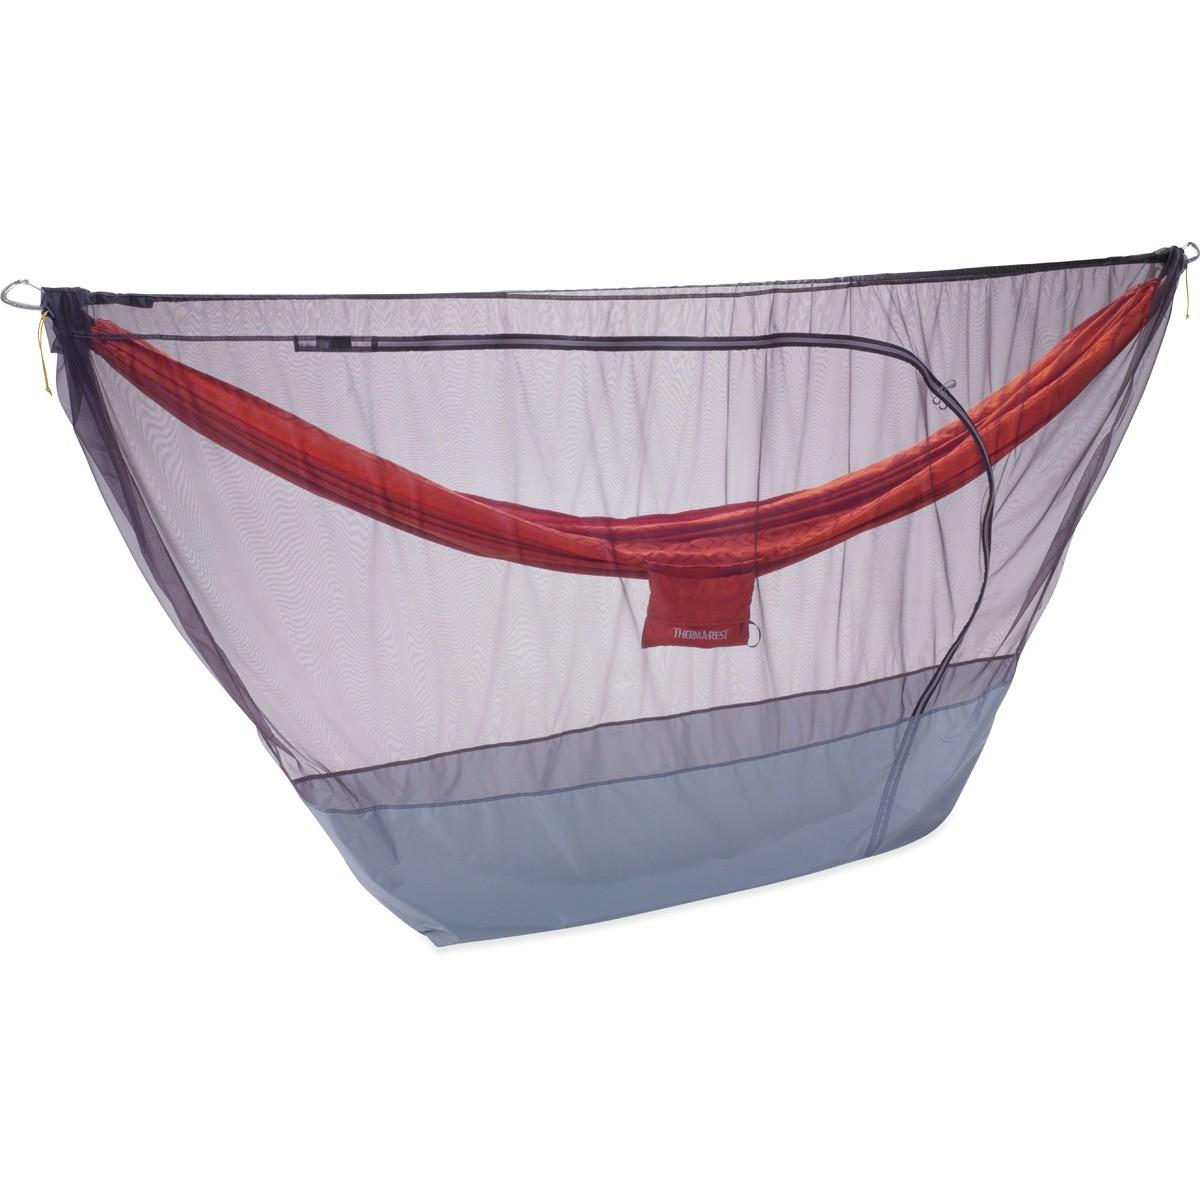 Therm-A-Rest Hammock Bug Net